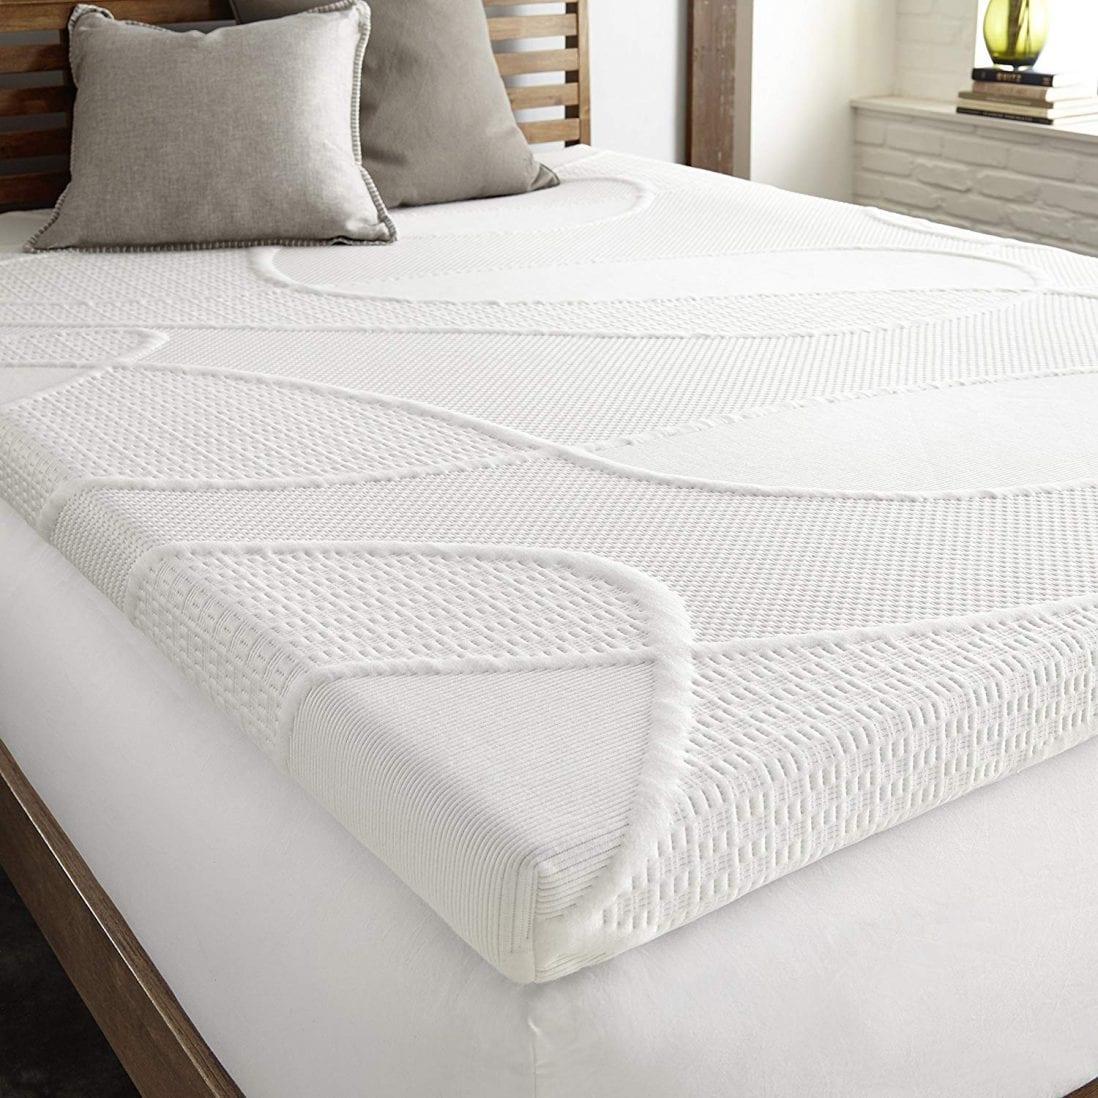 Perfect Cloud best soft mattress topper reviews by www.dailysleep.org